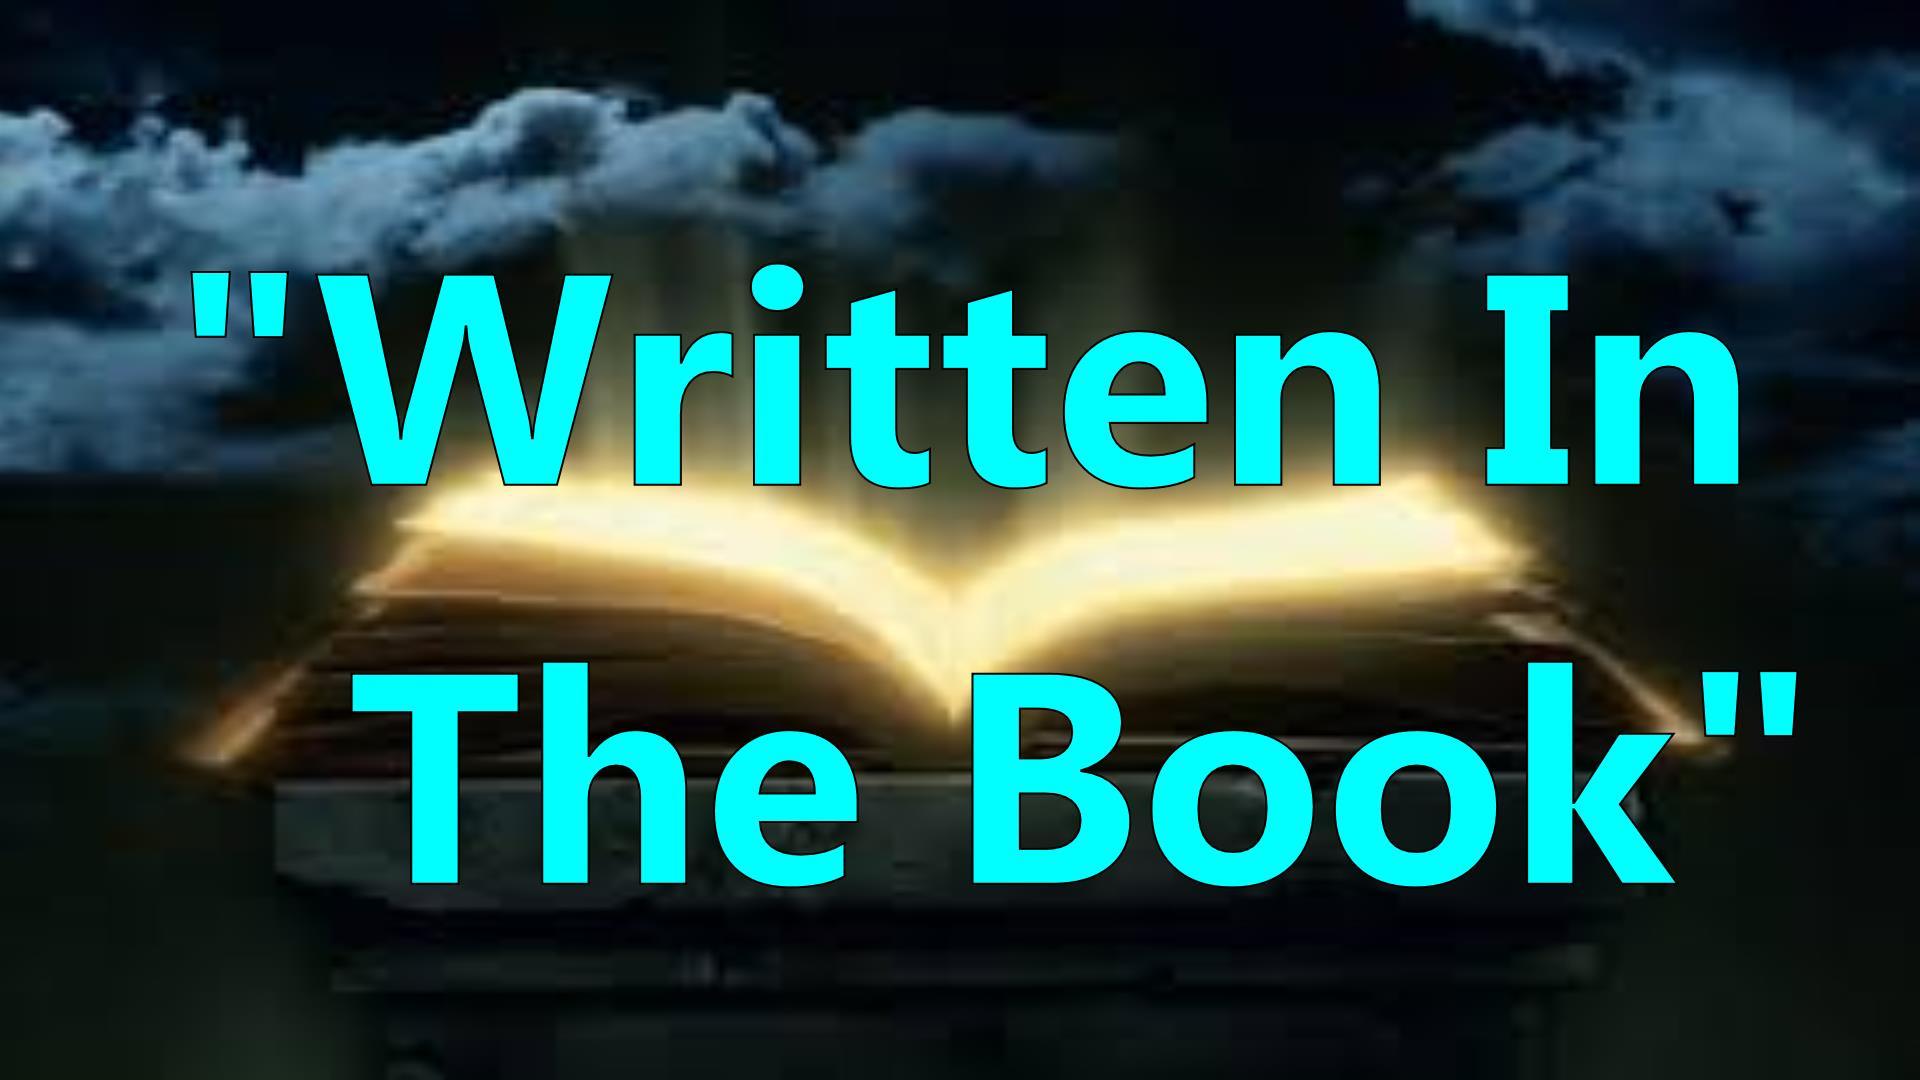 WRITTEN IN THE BOOK